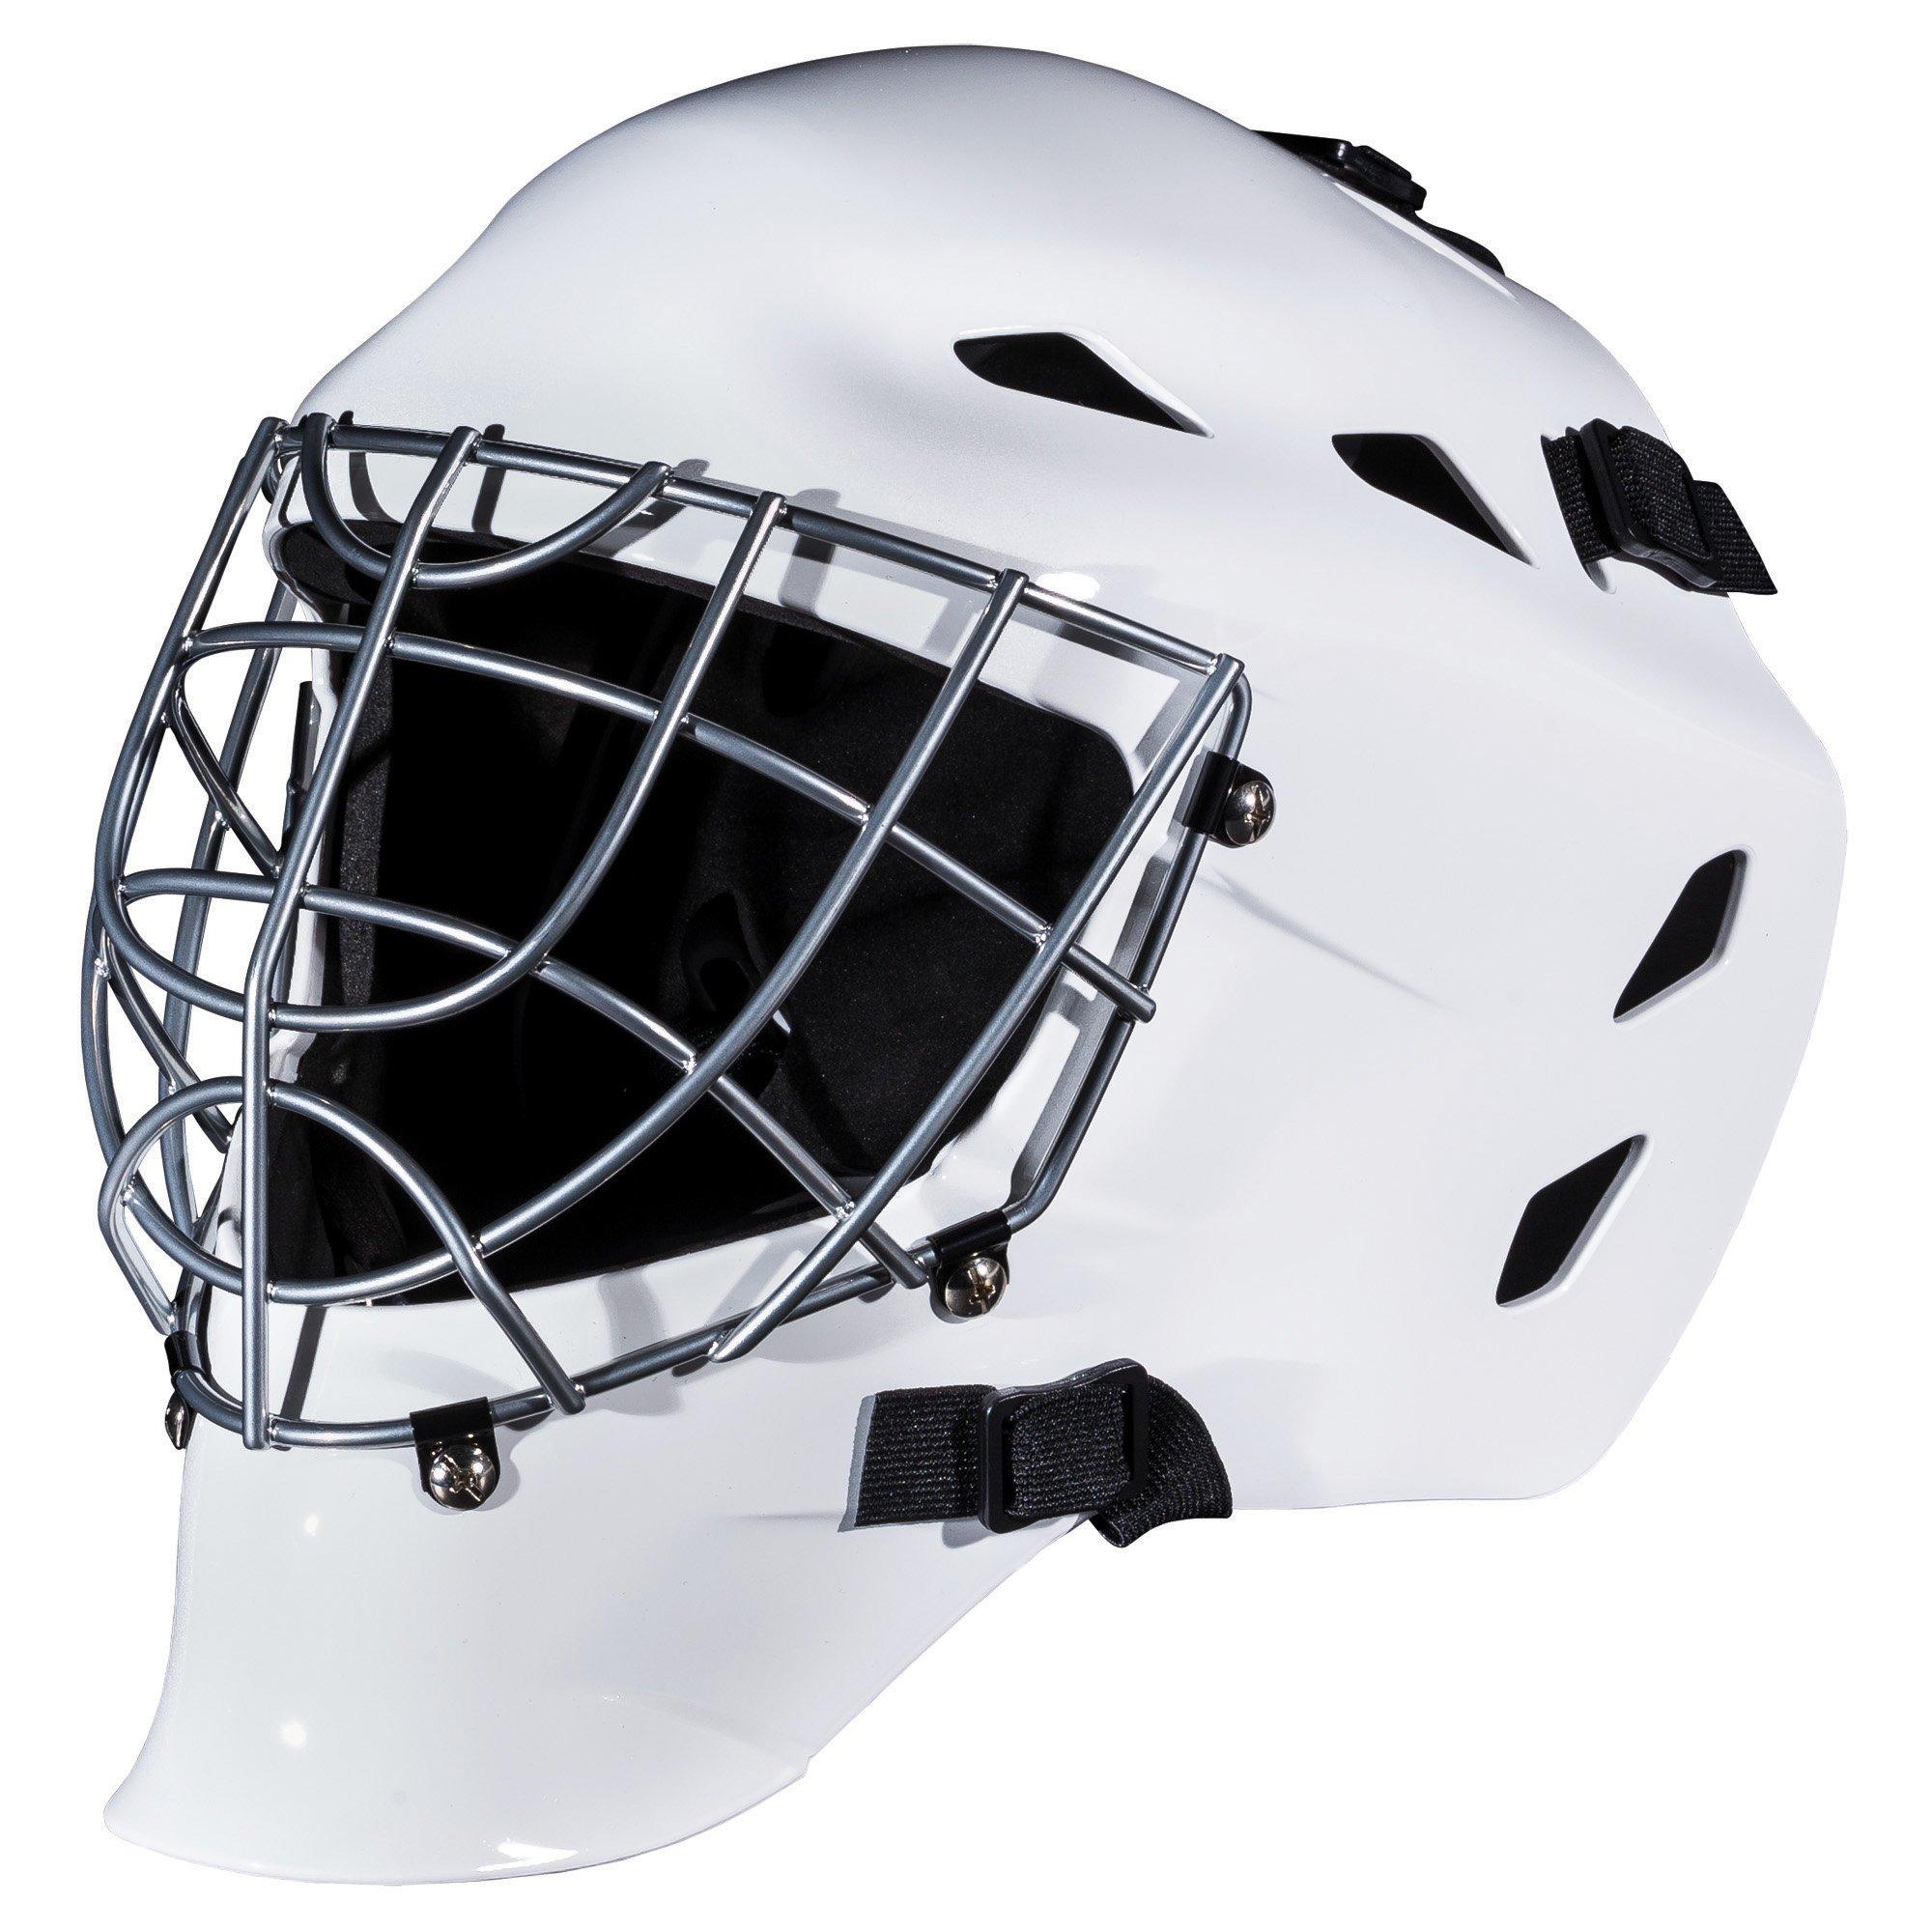 Franklin Sports Hockey Goalie Mask - GFM 1500 - White